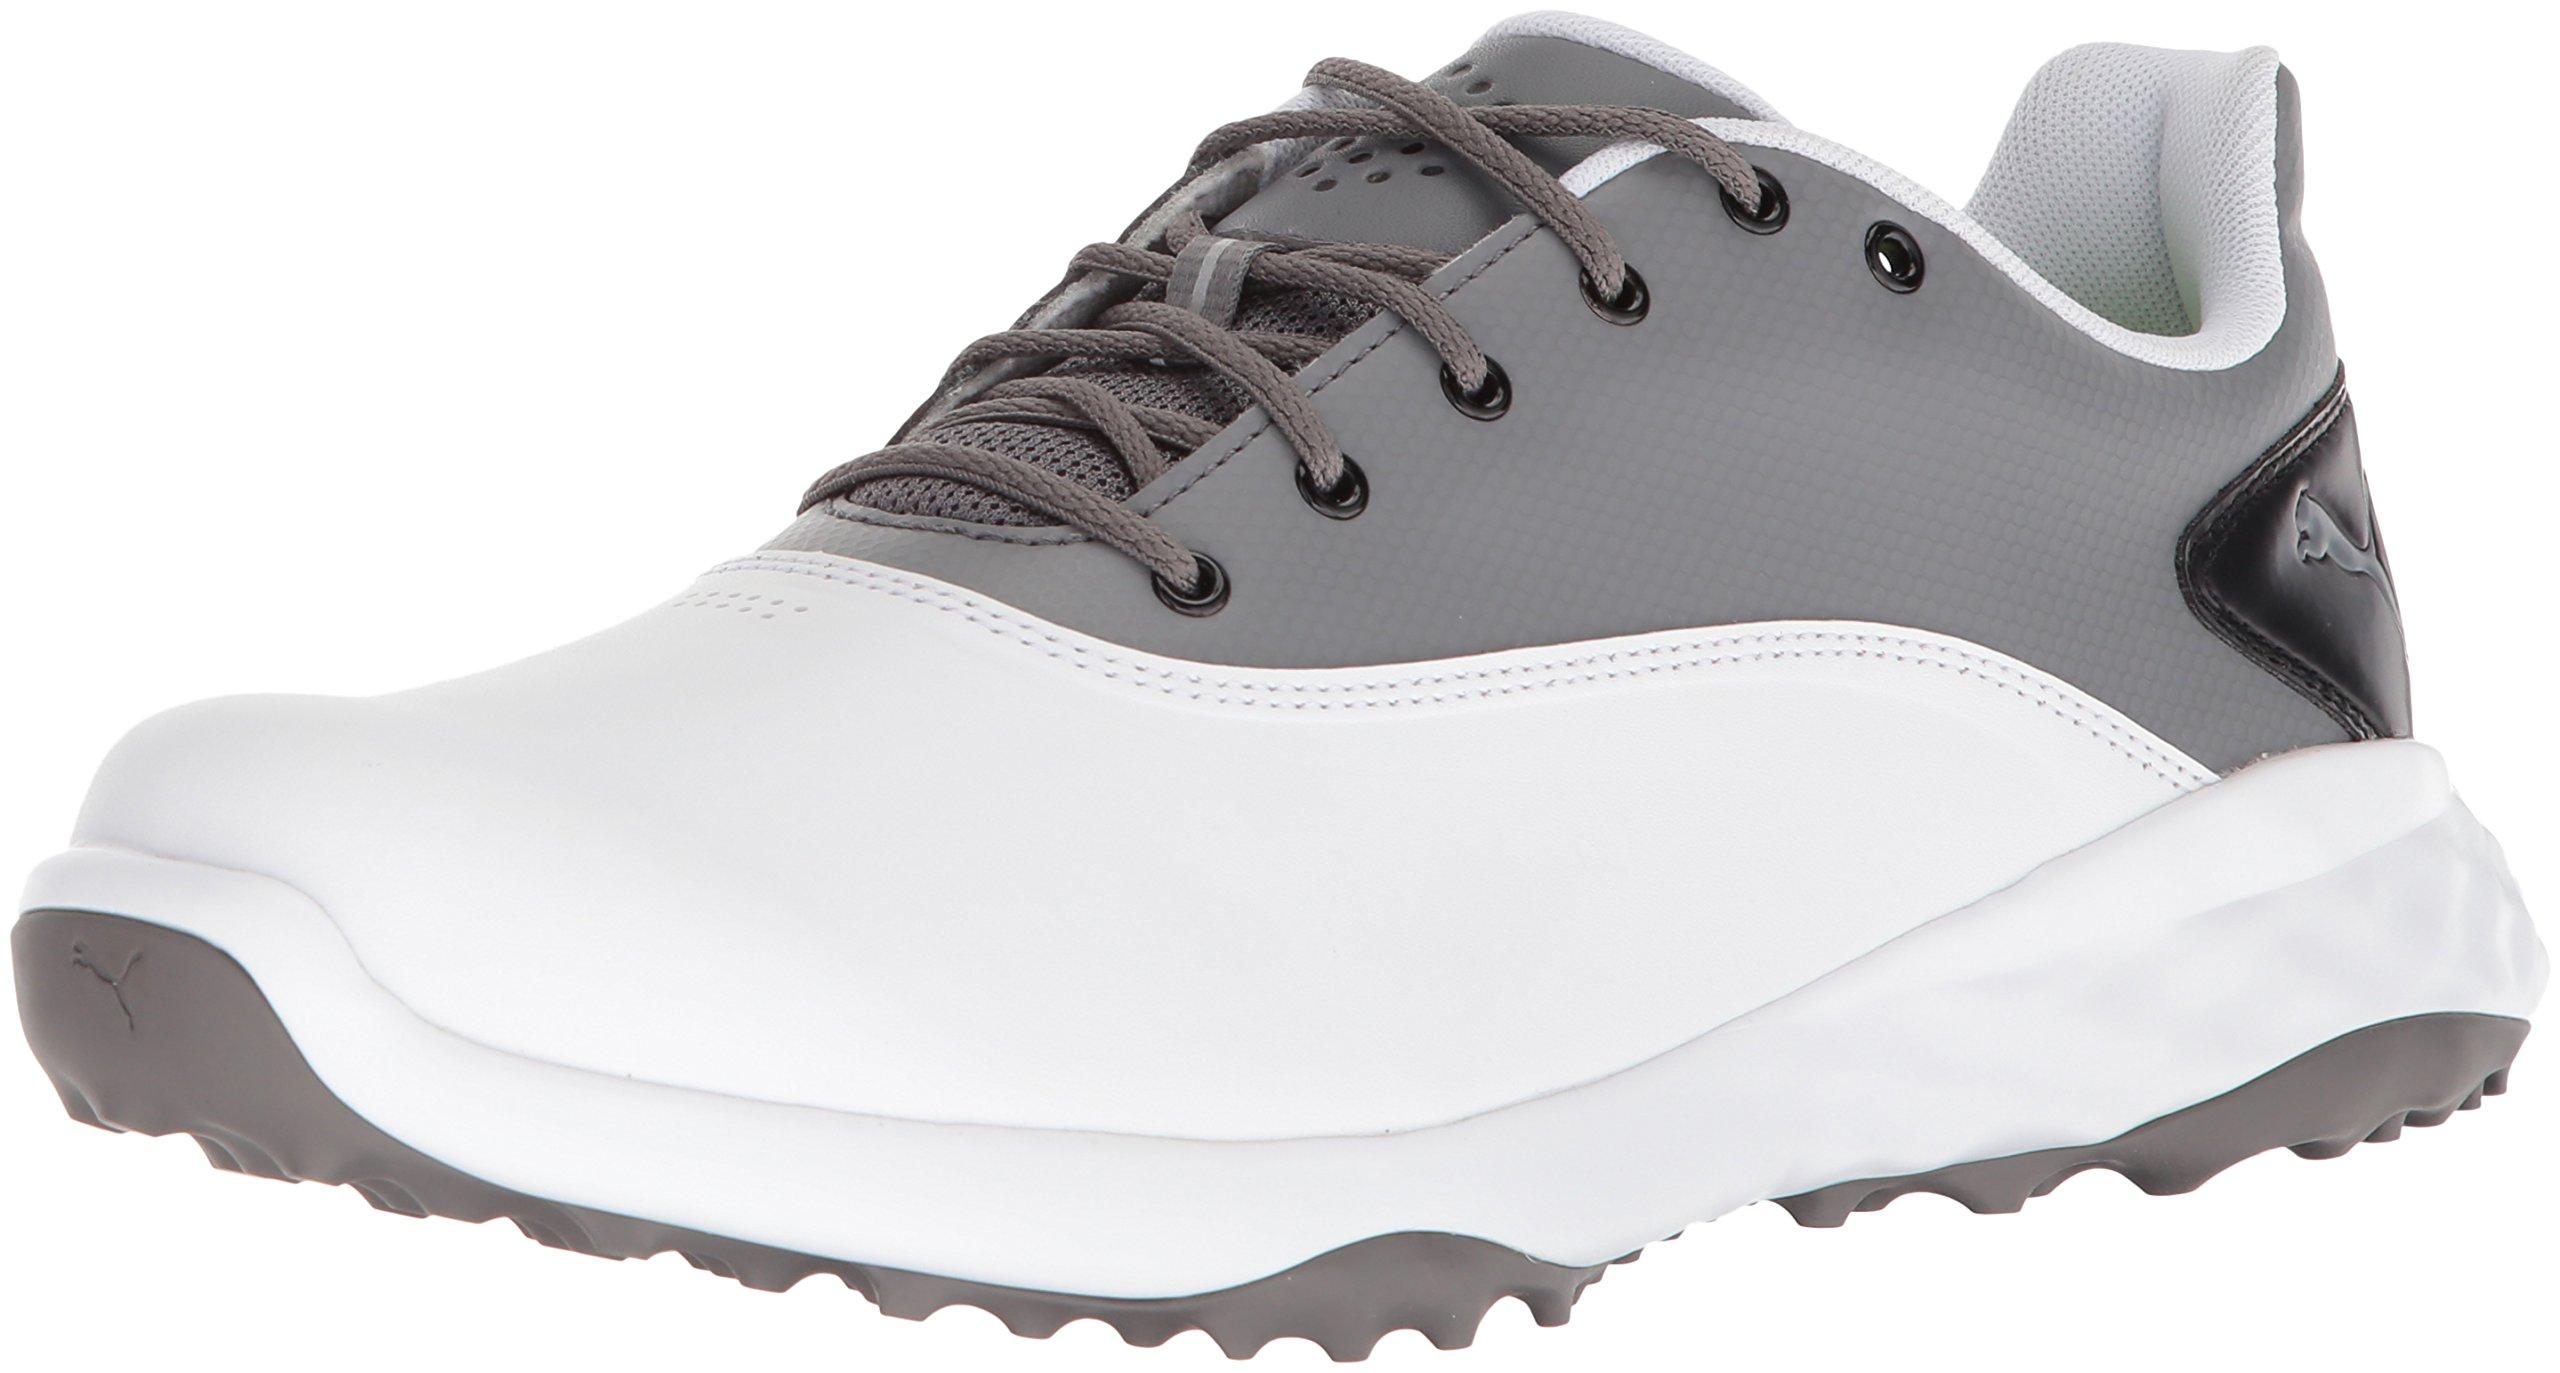 PUMA Golf Men's Grip Fusion Golf Shoe, White/Quiet Shade/Black, 7.5 Medium US by PUMA